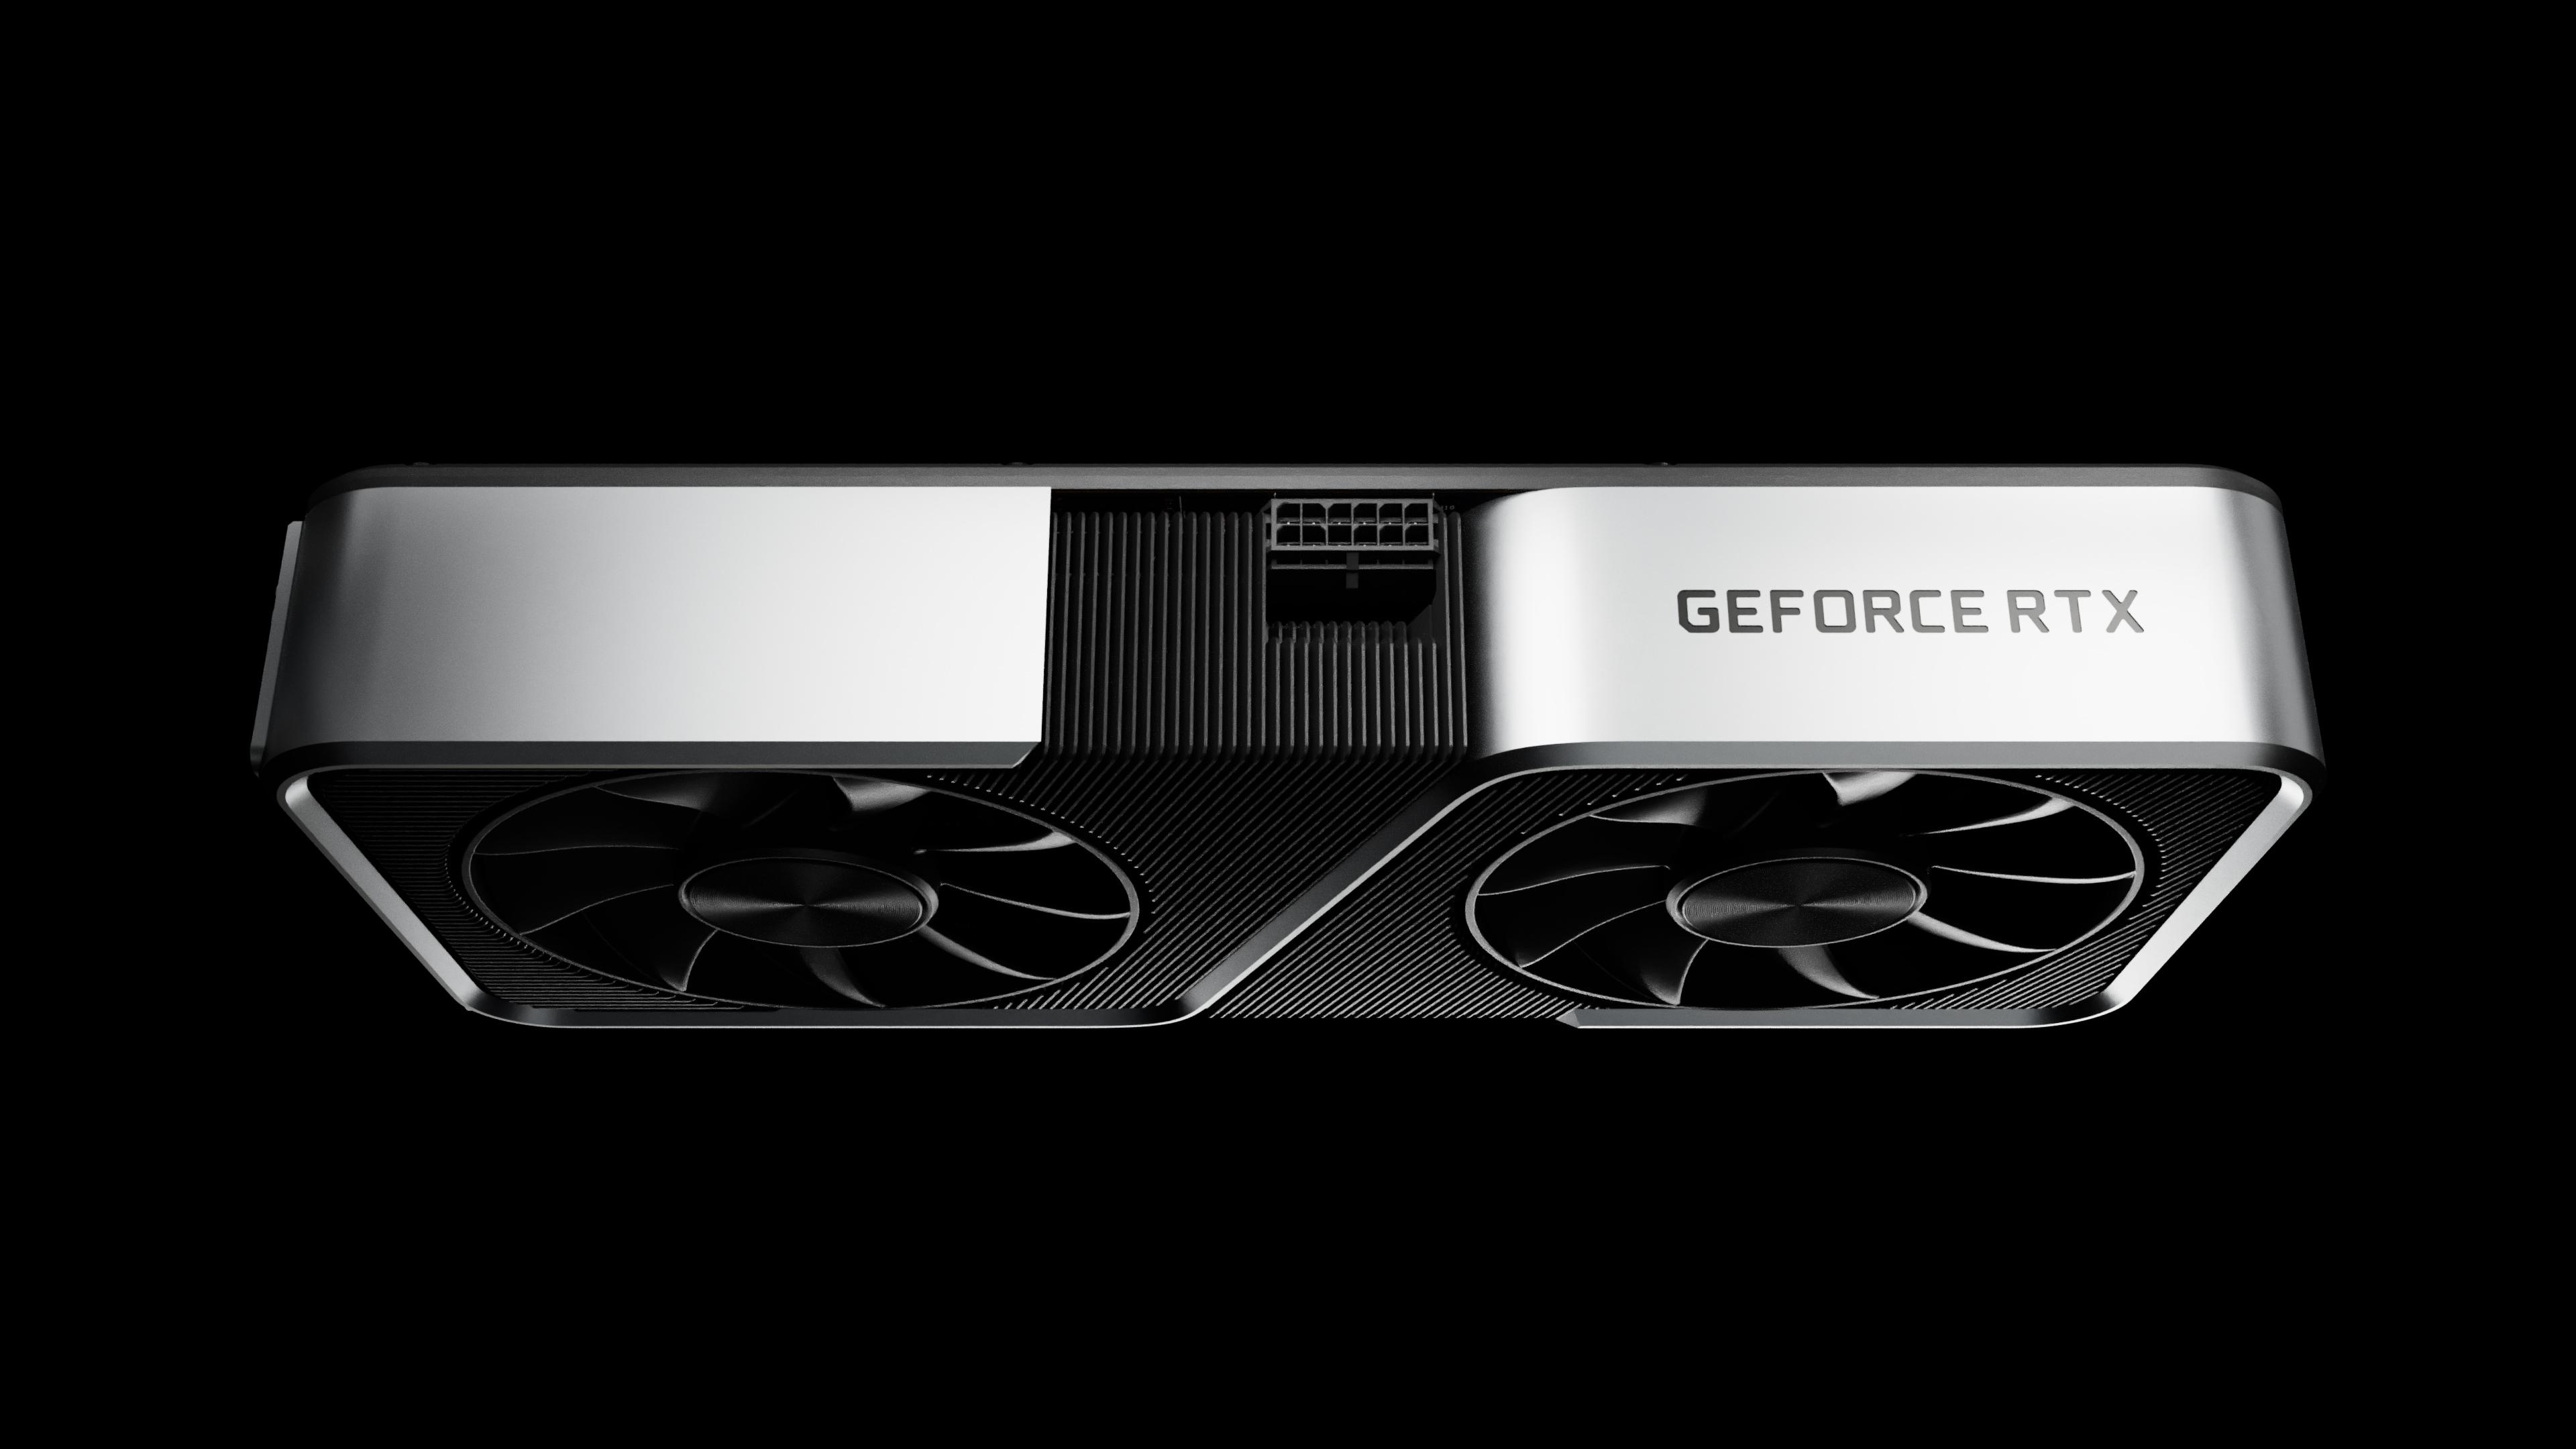 geforce rtx 3060 ti product gallery full screen 3840 2 bl NVIDIA เปิดตัวการ์ดจอ Nvidia GeForce RTX 3060 Ti รุ่นใหม่ล่าสุดพร้อมวางจำหน่ายในราคา 14,000บาทไทย